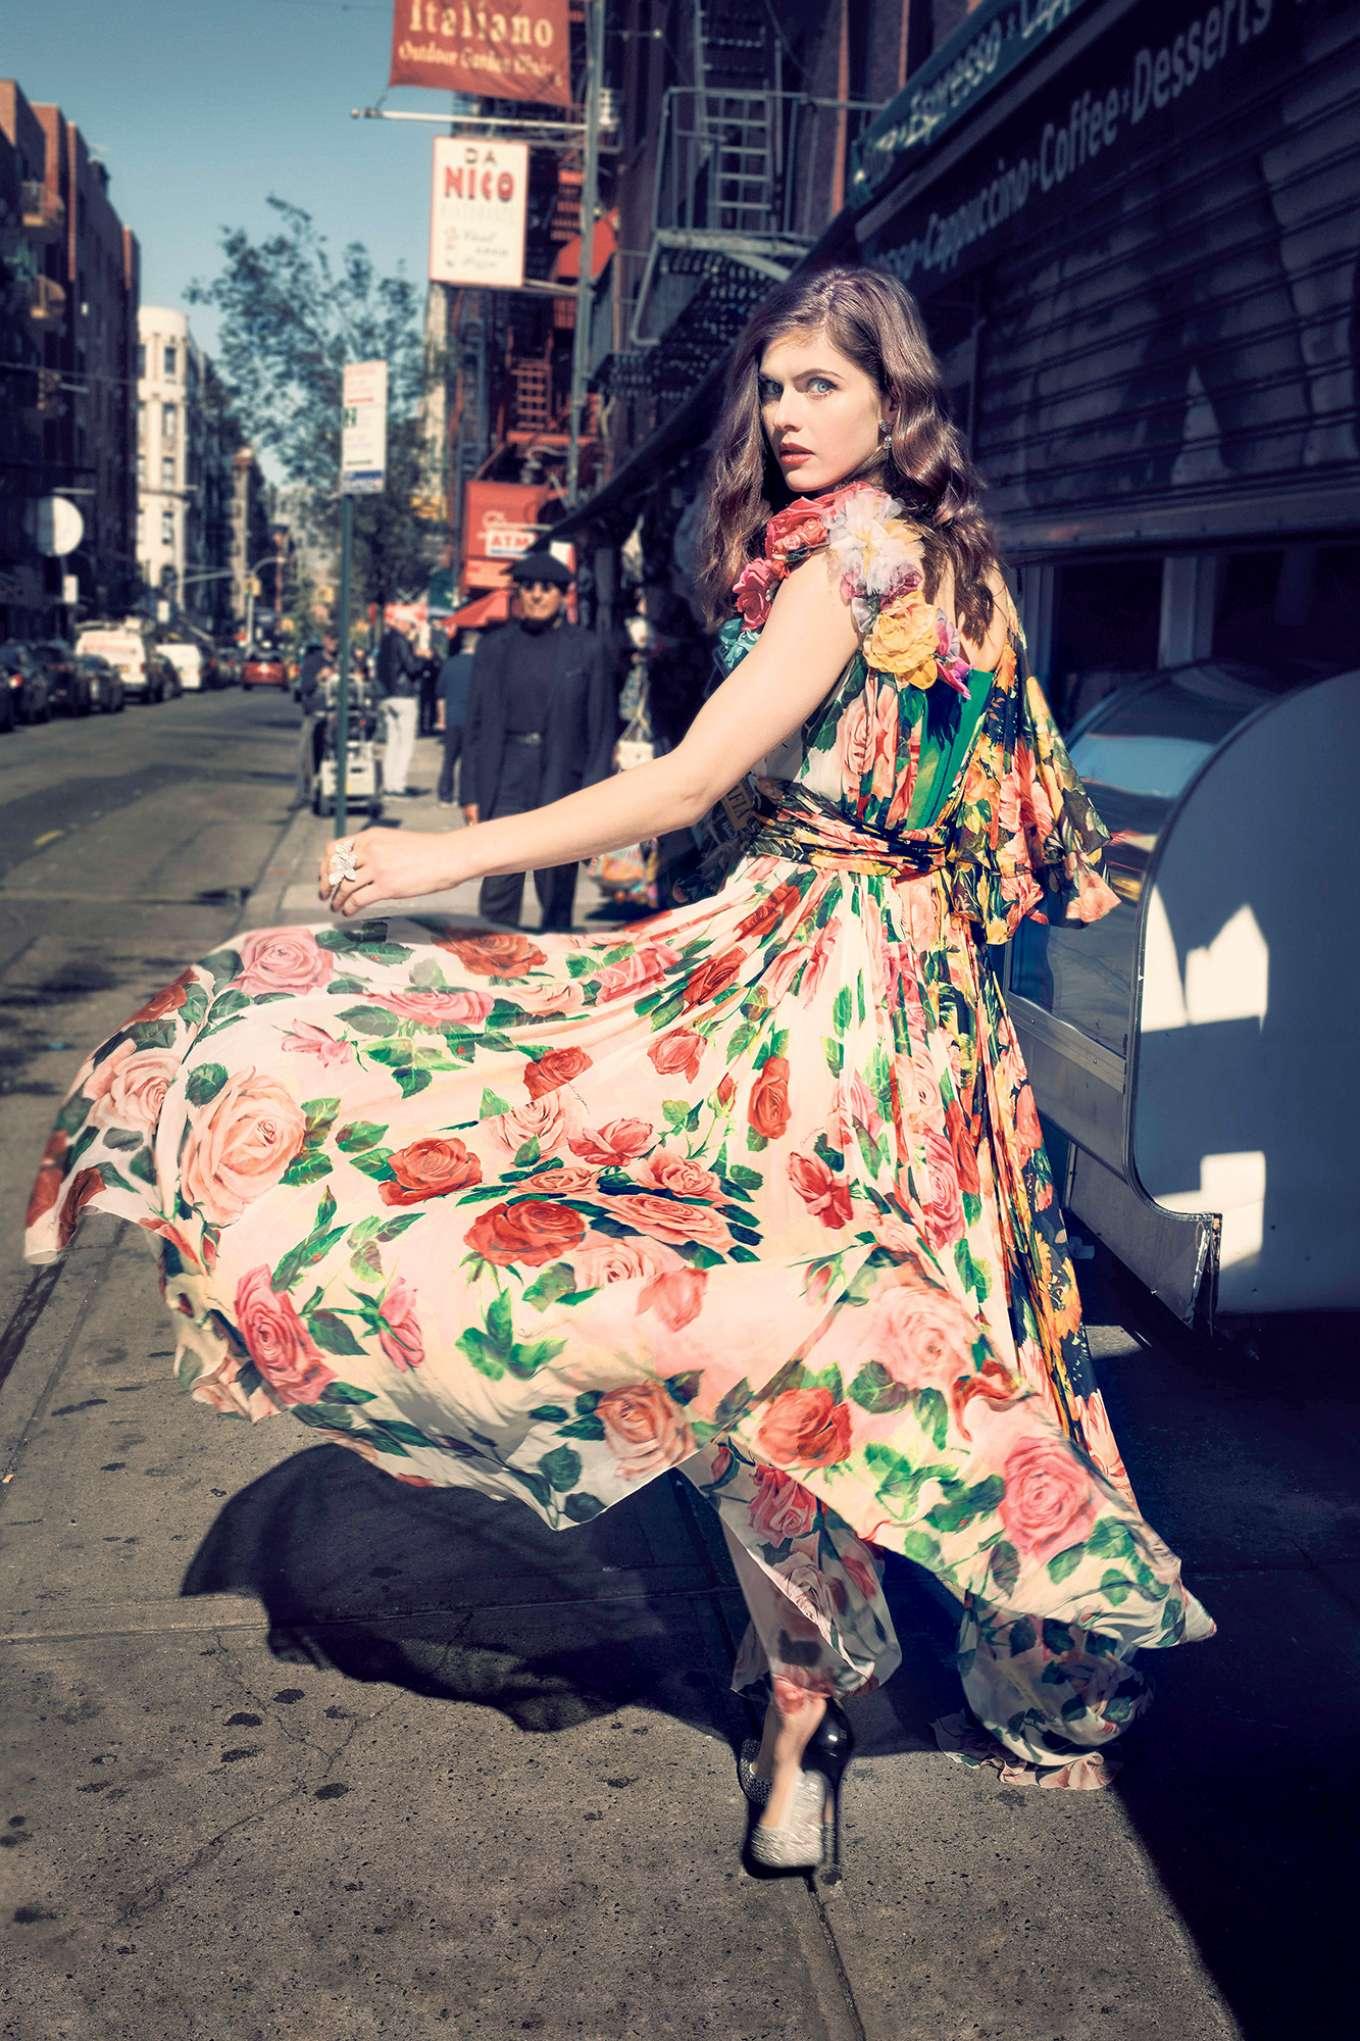 Alexandra Daddario 2019 : Alexandra Daddario – New York Post Photoshoot by Christopher Cameron 2019-02